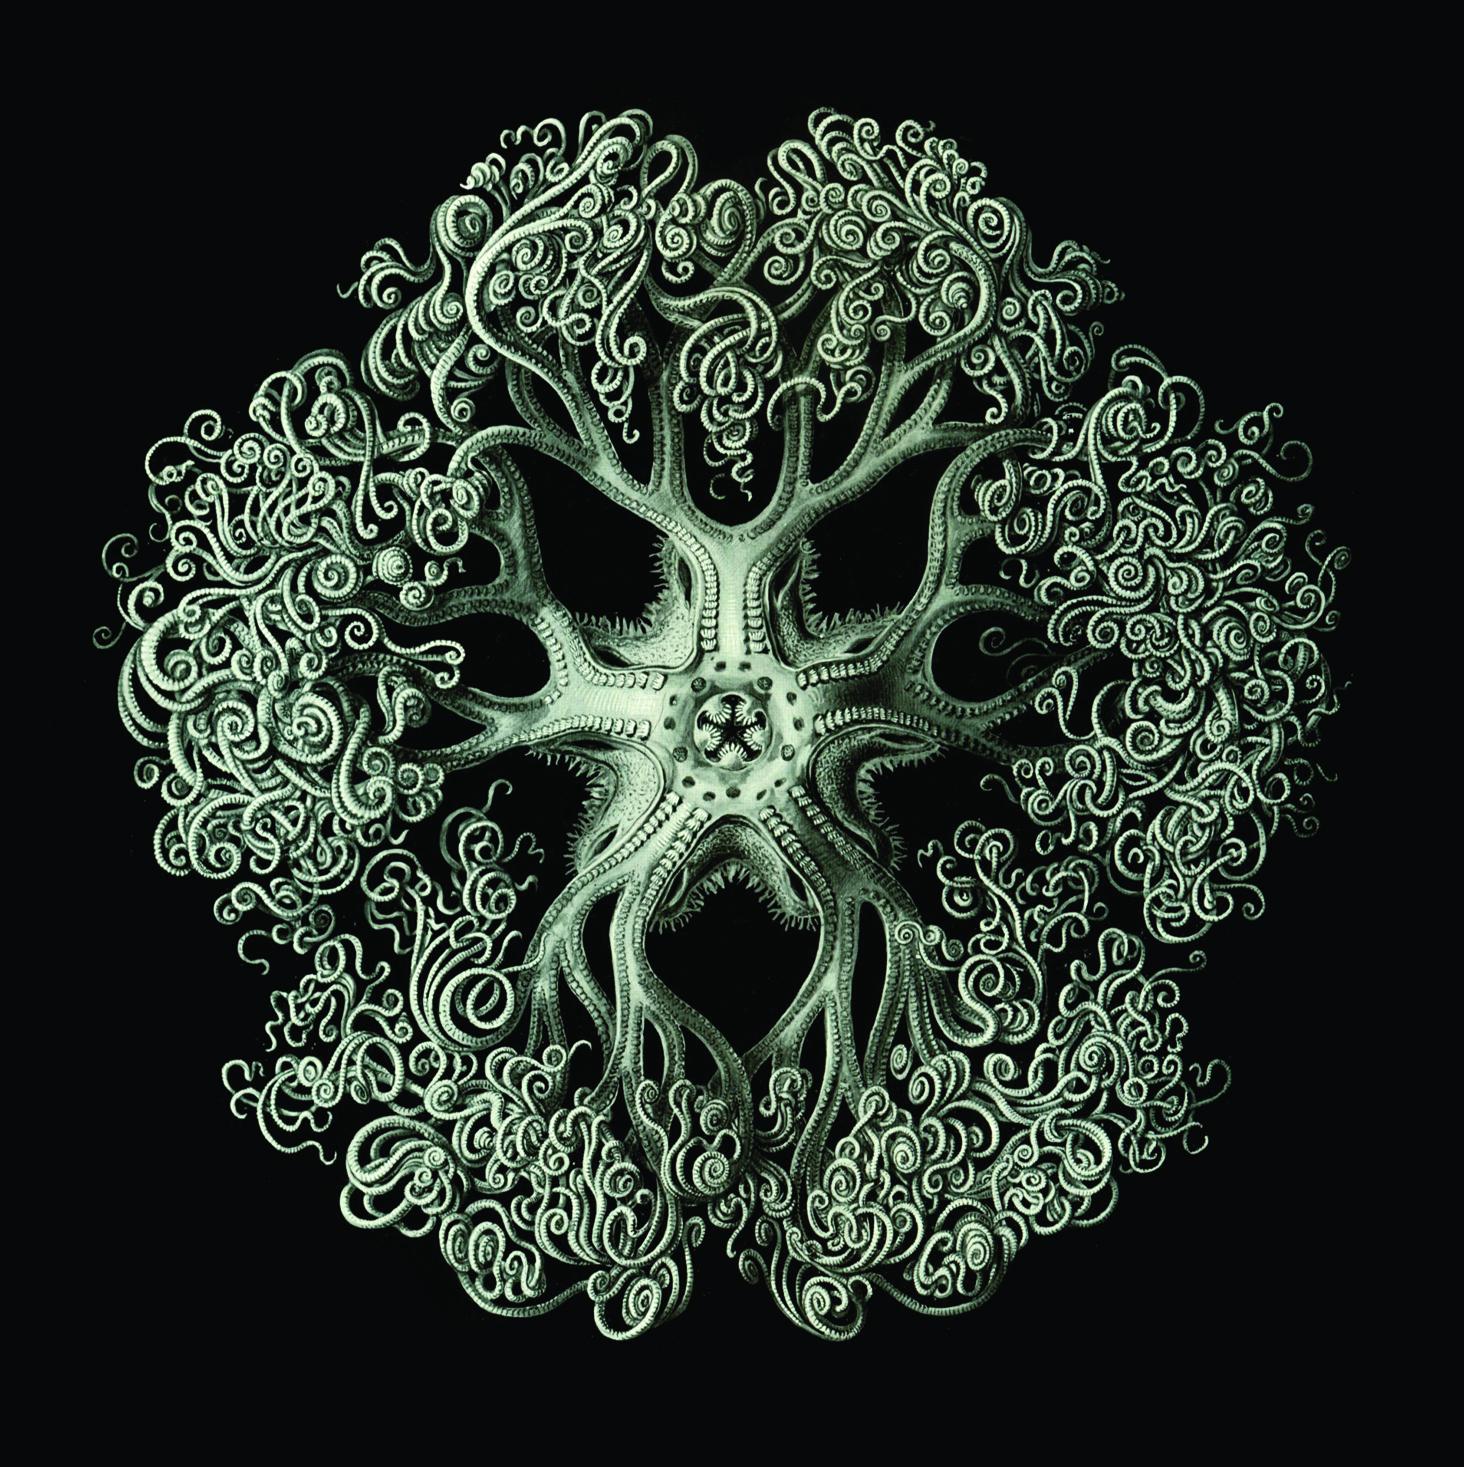 Emma Pollock & RM Hubbert - Tour EP - Digital Single (2012) - Emma Pollock